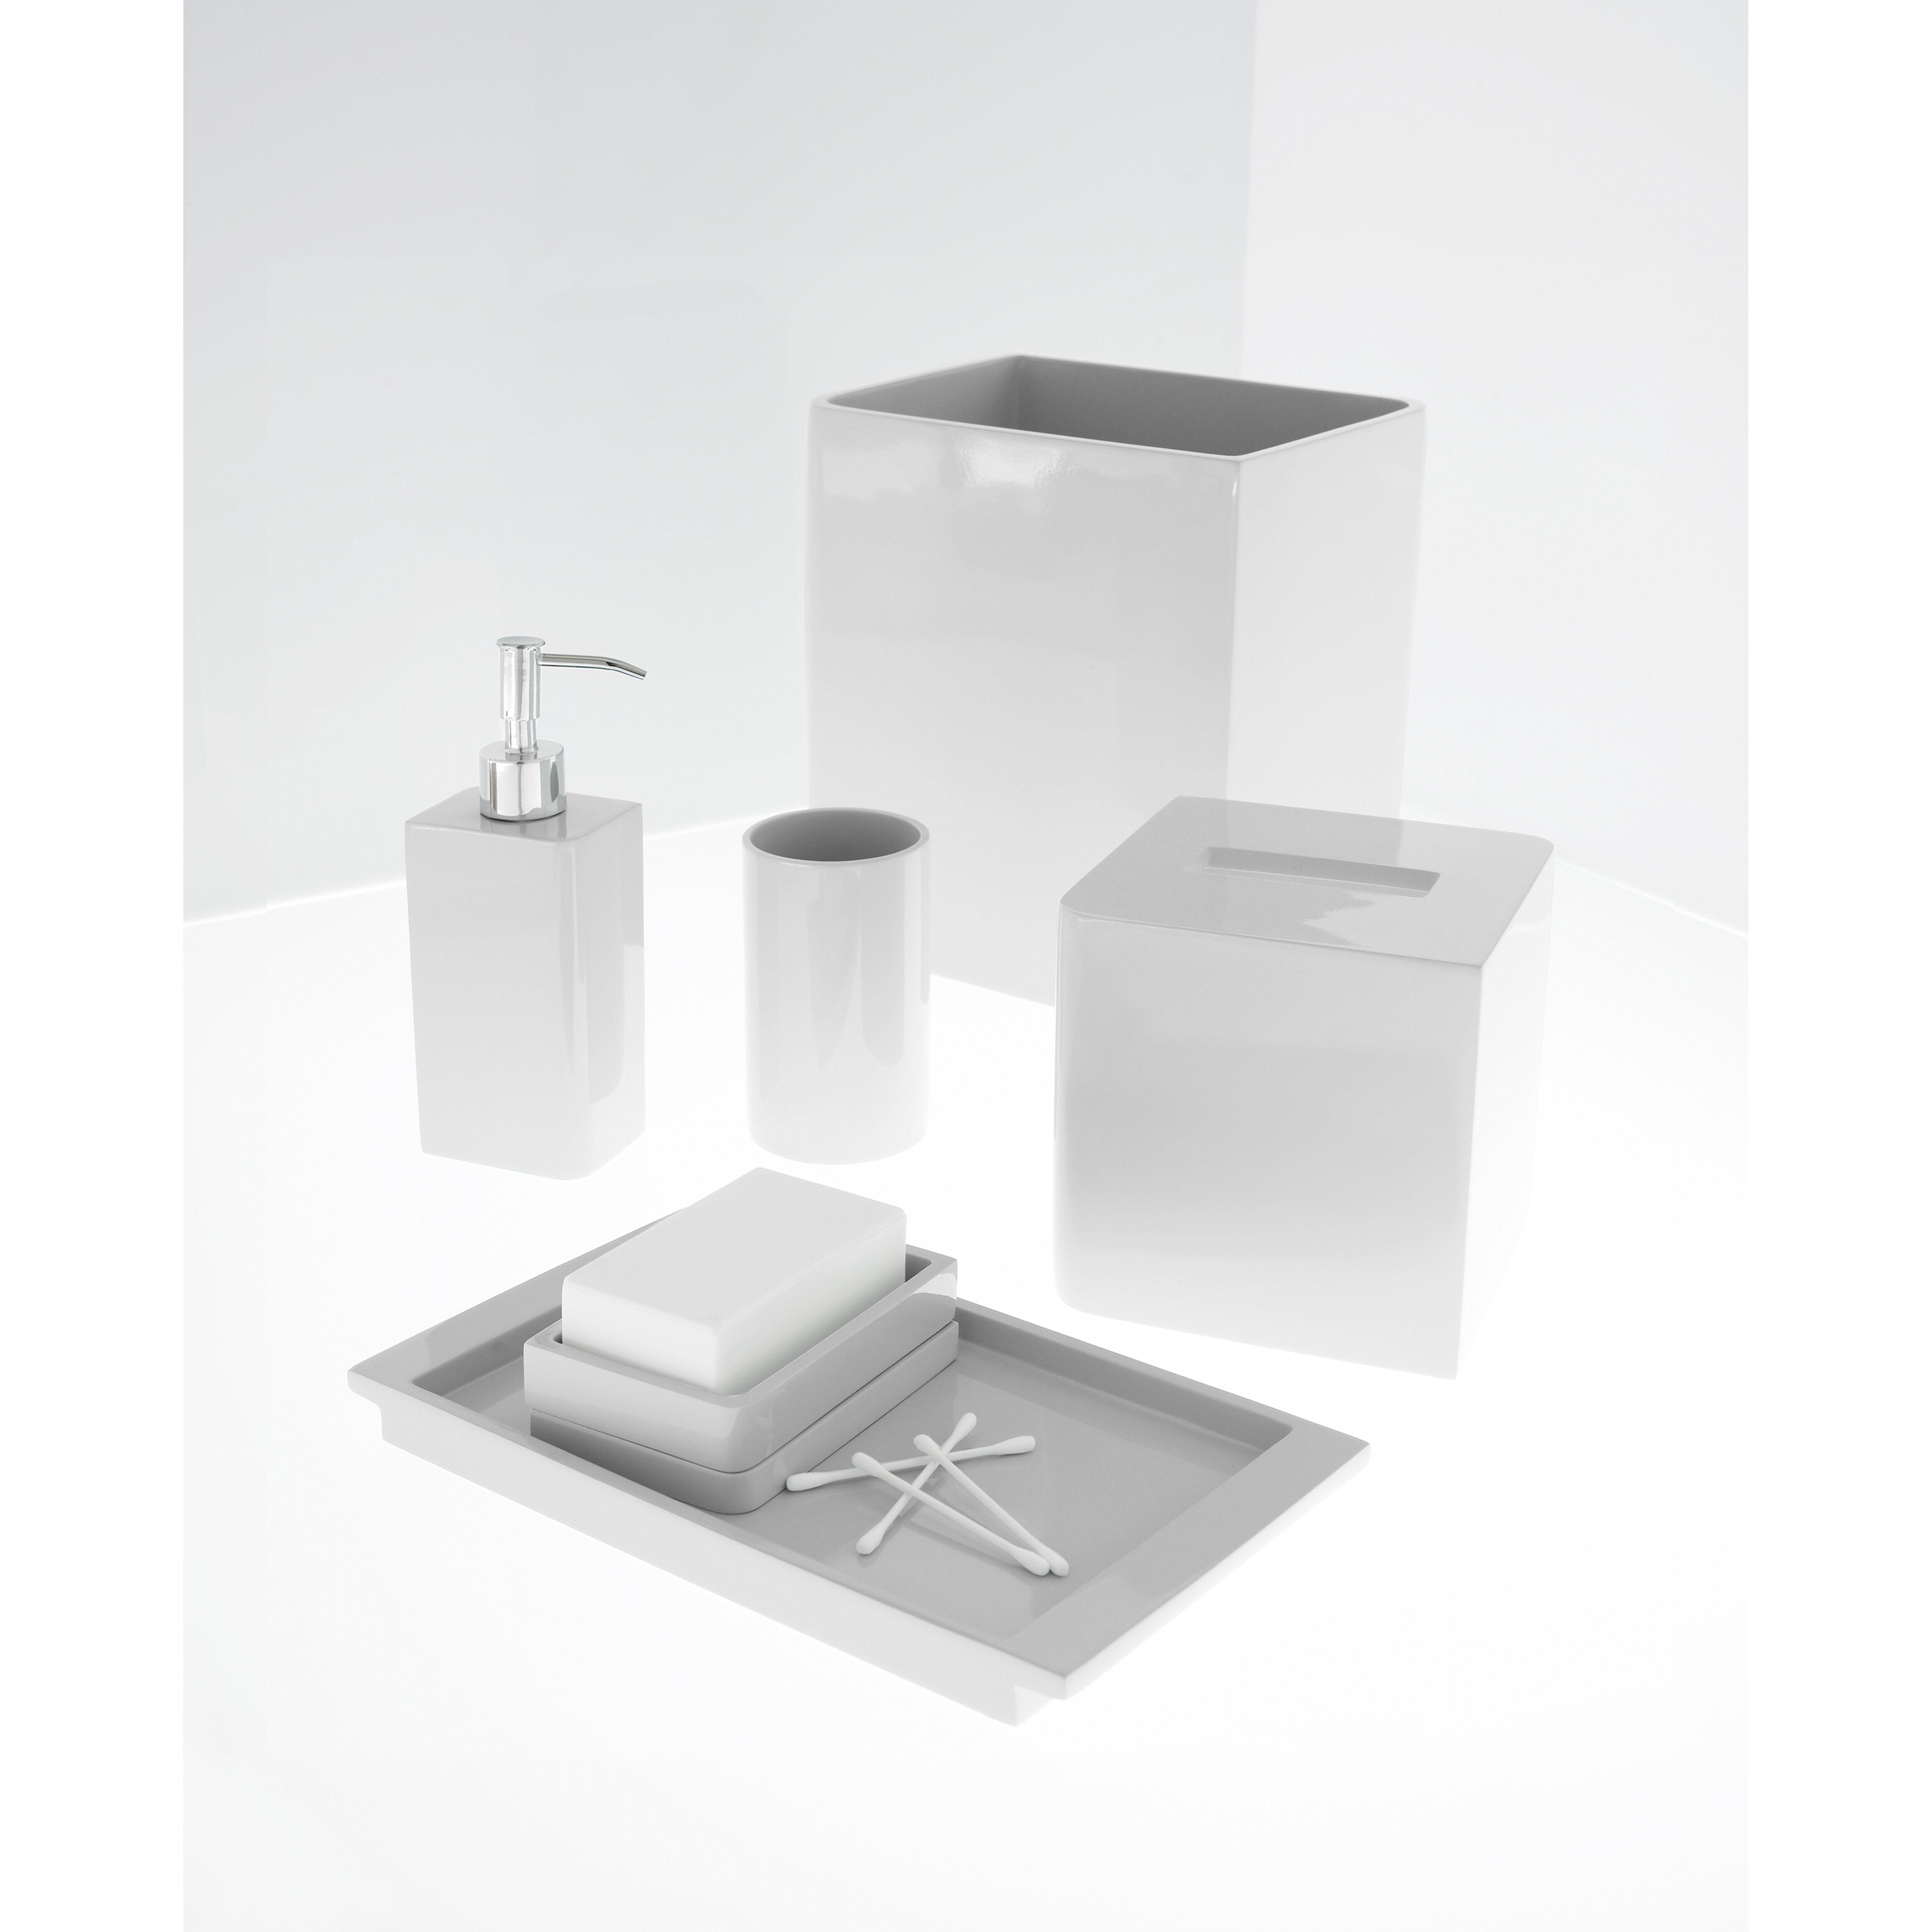 Kassatex lacca bath accessories waste basket reviews for Basket bathroom accessories